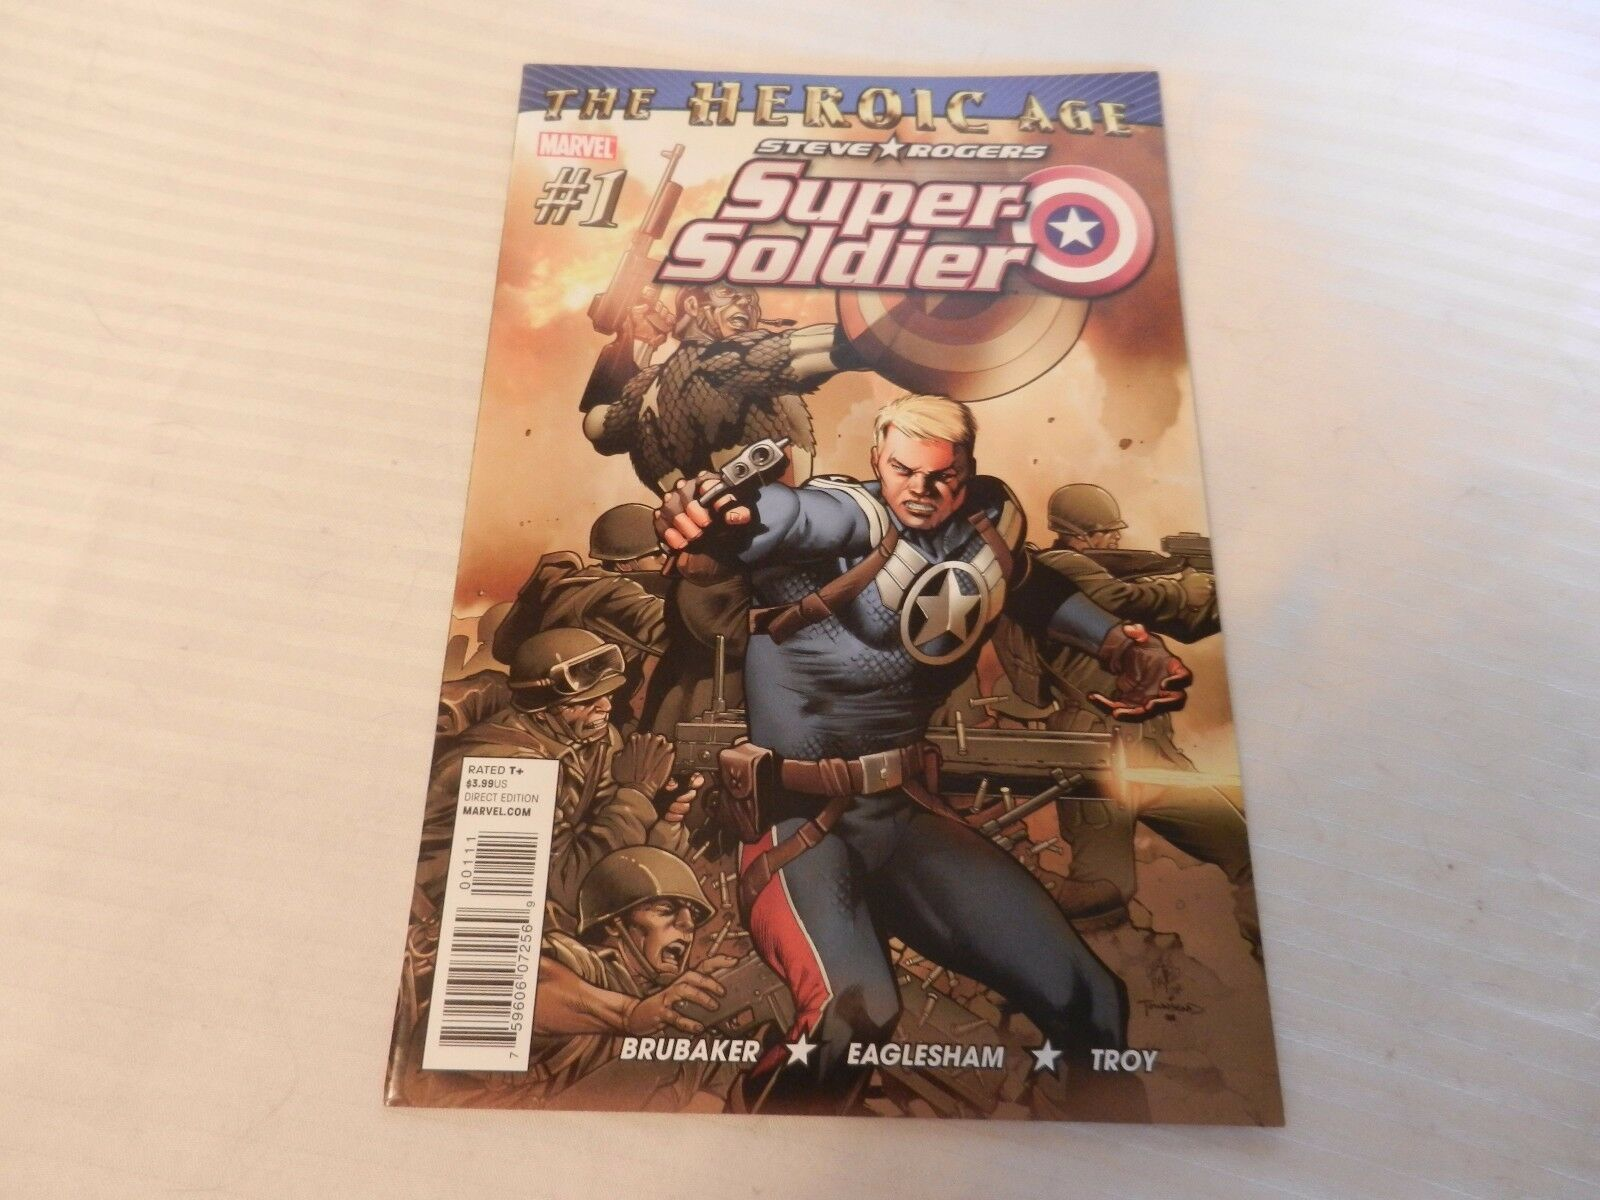 The Heroic Age Steve Rogers Super-Soldier Marvel Comics #1 September 2010